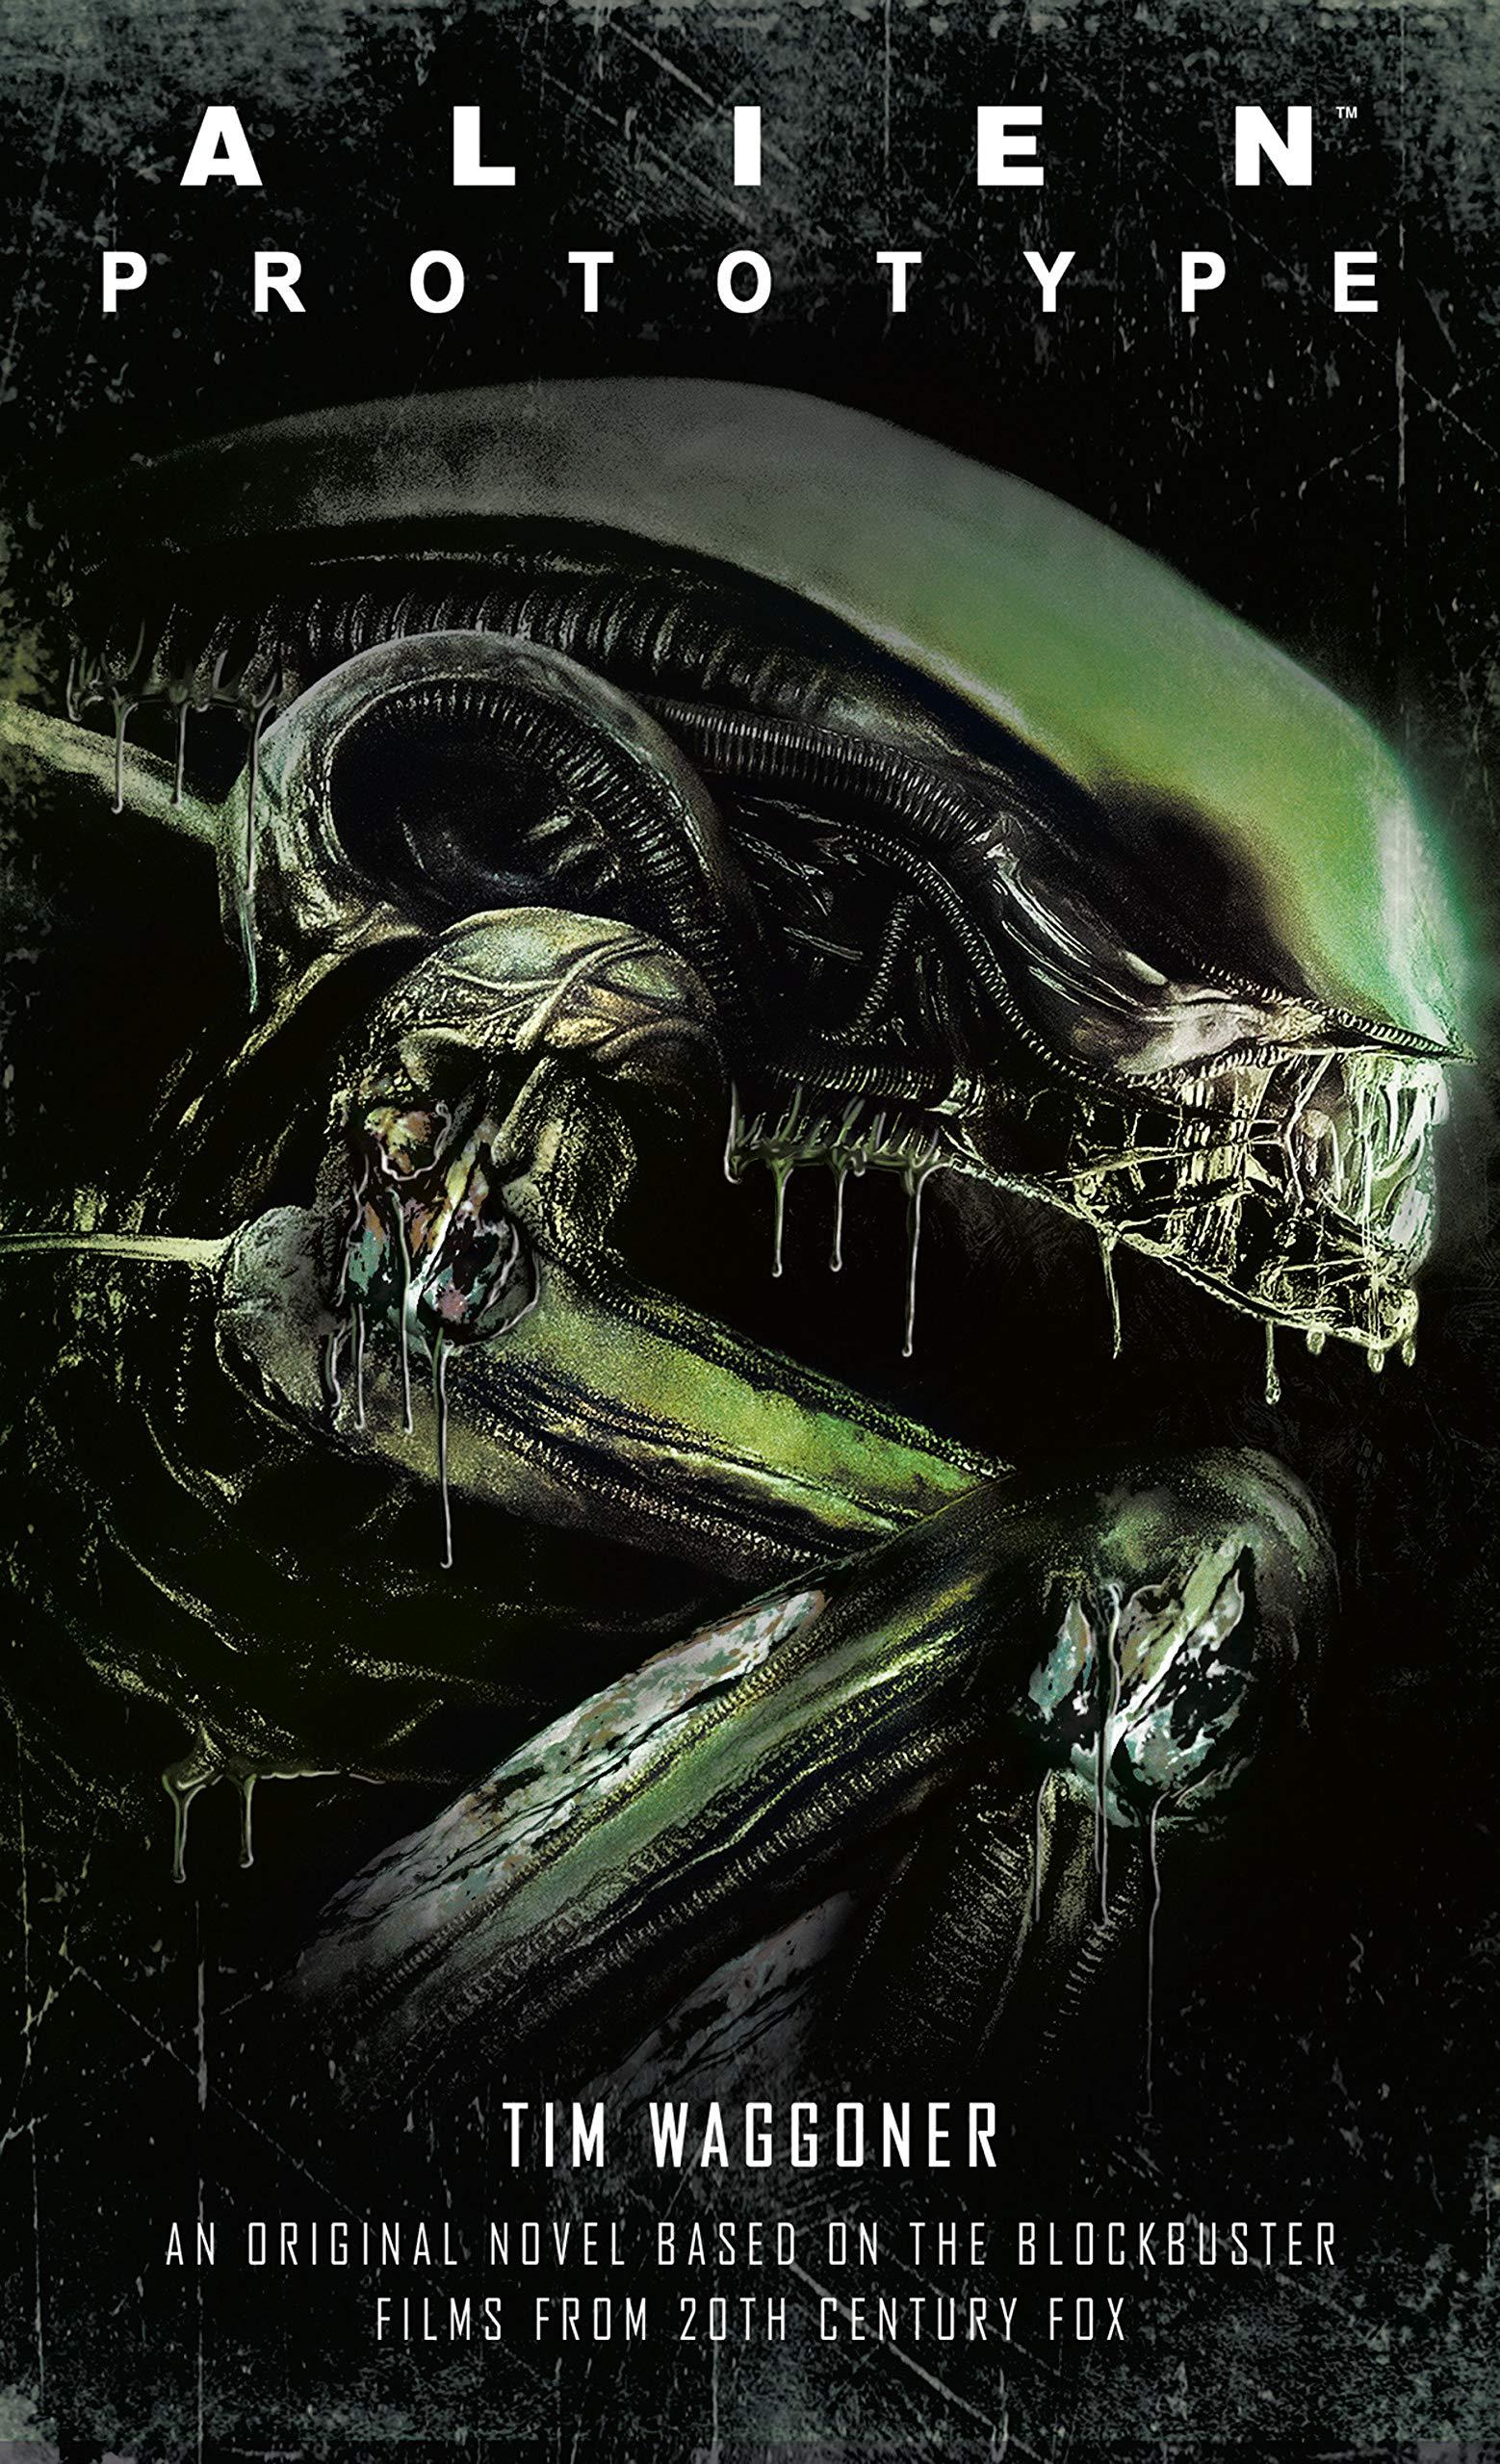 Amazon.com: Alien: Prototype: 9781789090918: Waggoner, Tim: Books